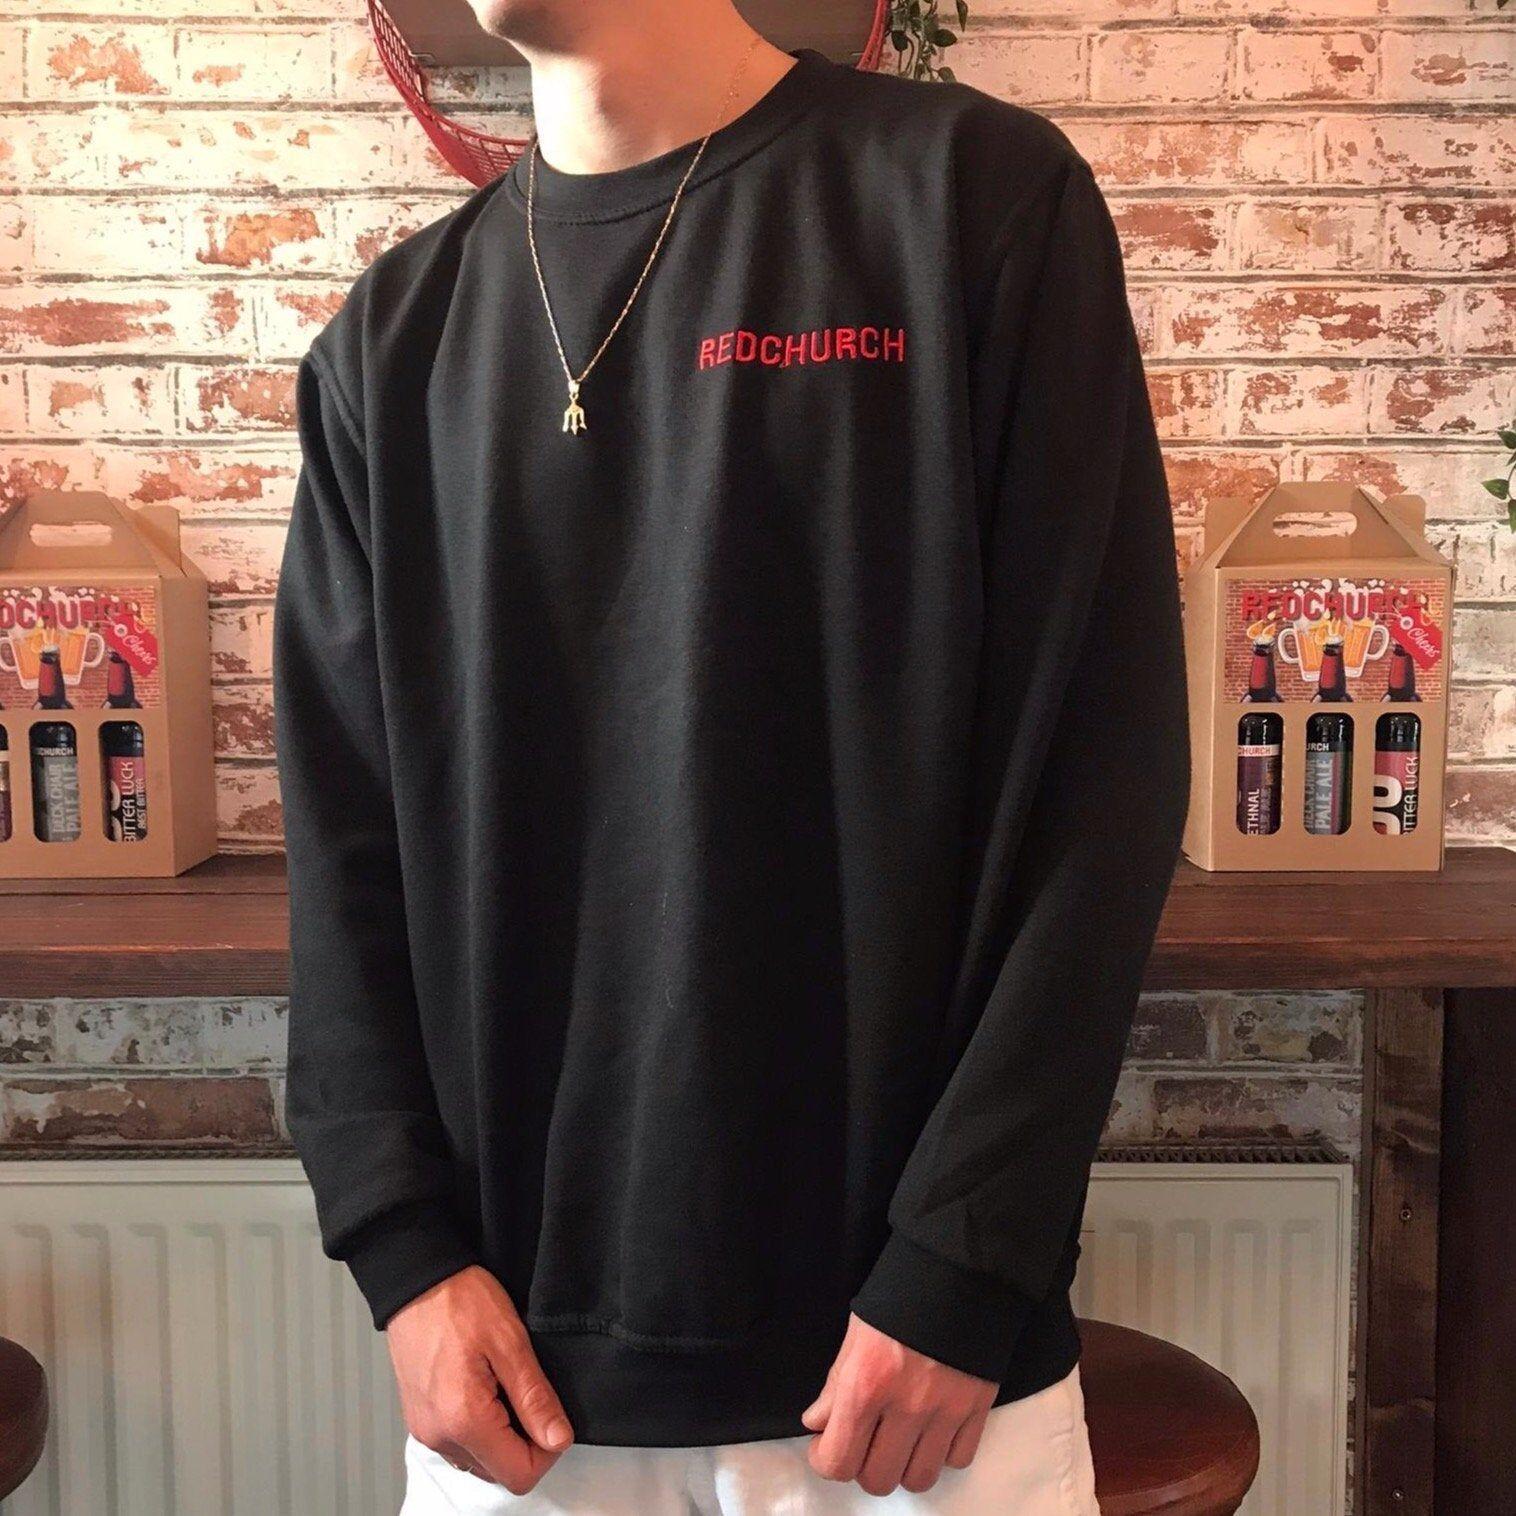 Redchurch Brewery Redchurch Embroidered Sweat Shirt - XXL 46-48